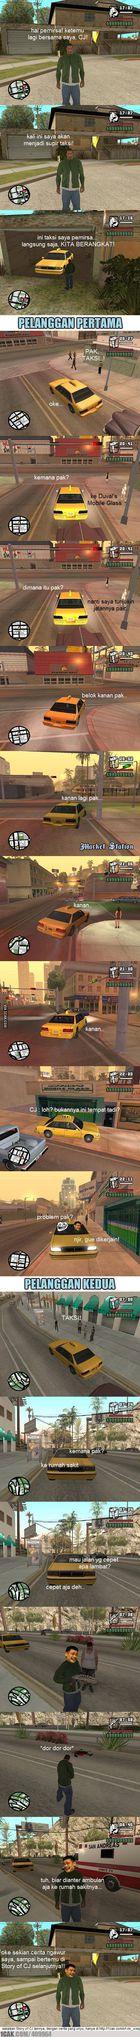 Cj jadi supir taksi story